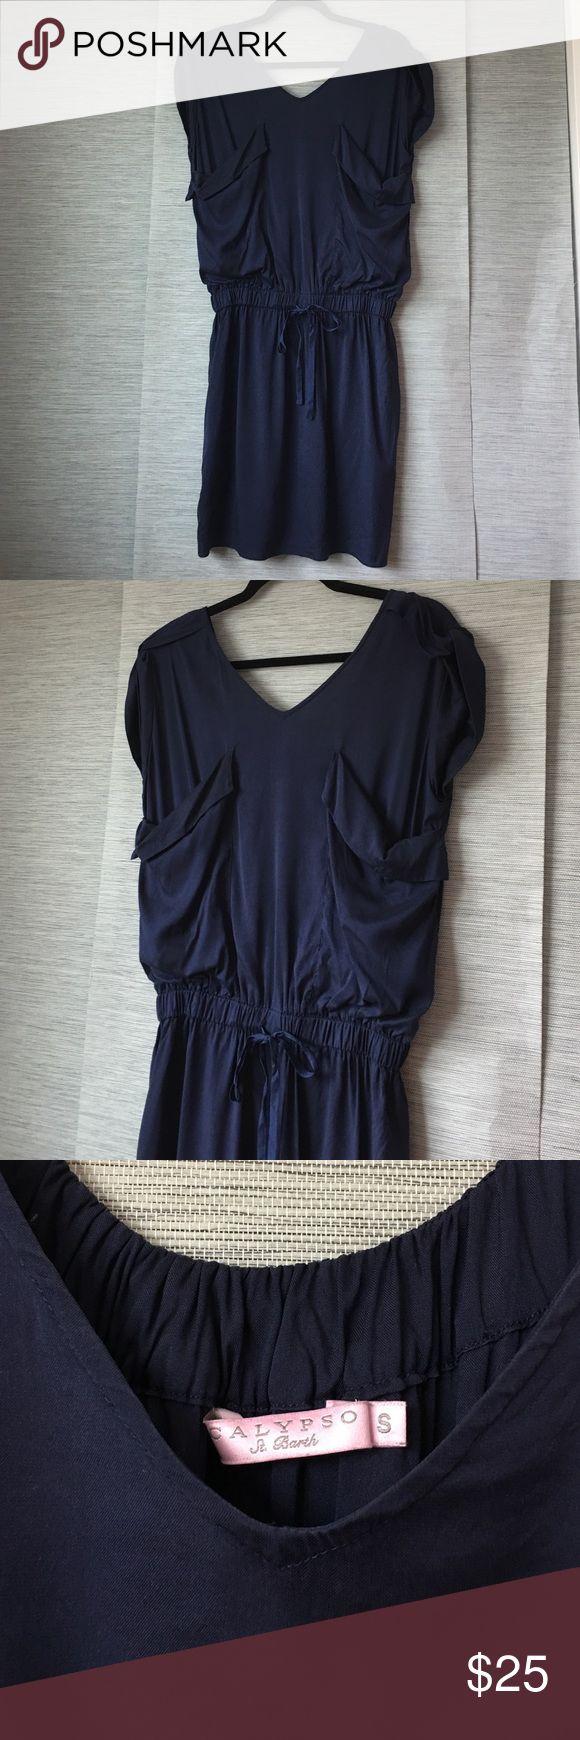 CALYPSO SAINT BARTHS COTTON SILK DRESS Cotton silk blend navy jumper dress size small. Can fit medium Calypso St. Barth Dresses